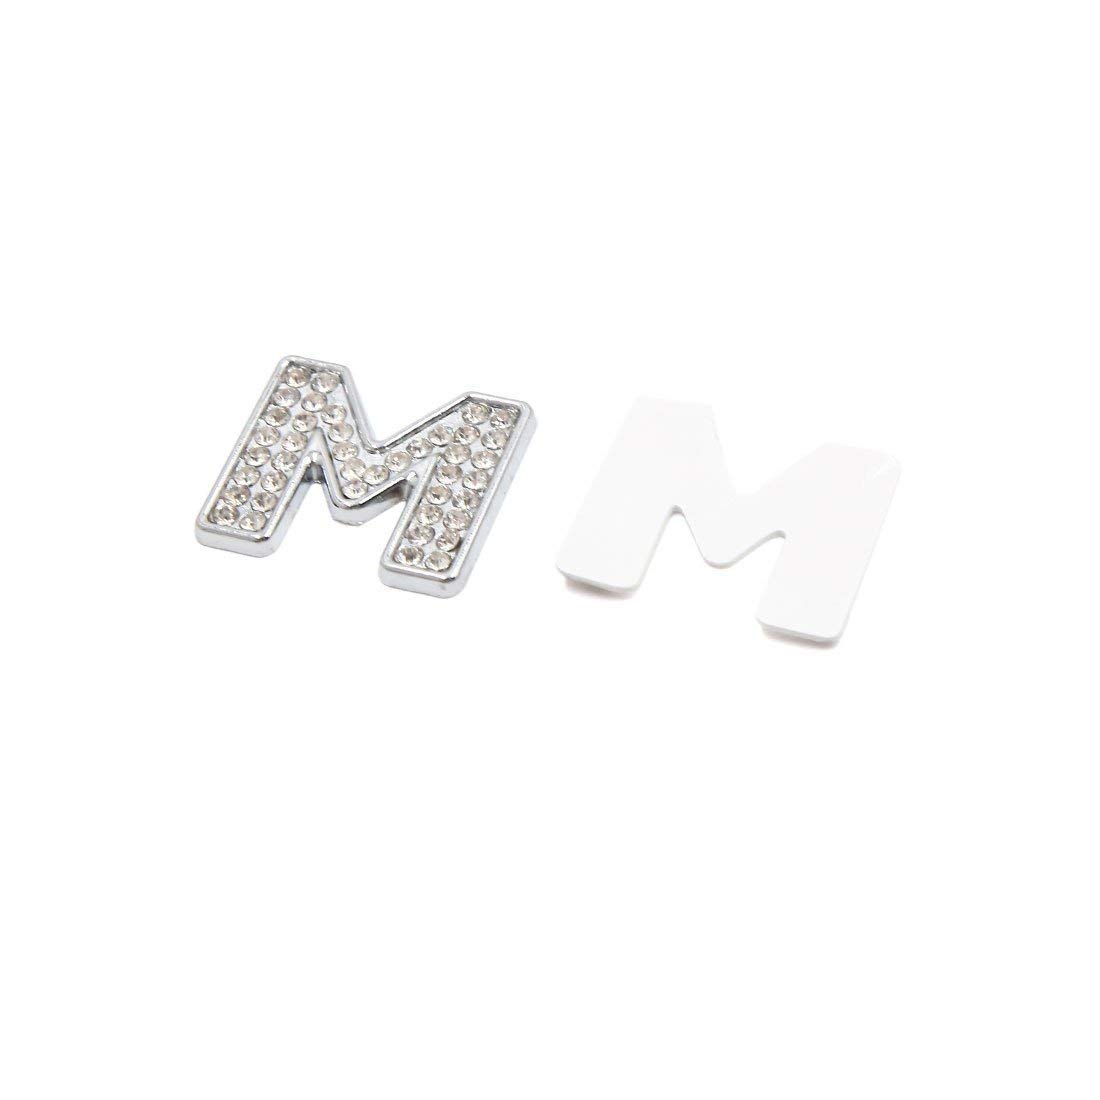 3D Silver Tone Metal Letter A Shaped Car Emblem Badge Sticker Decal Decoration